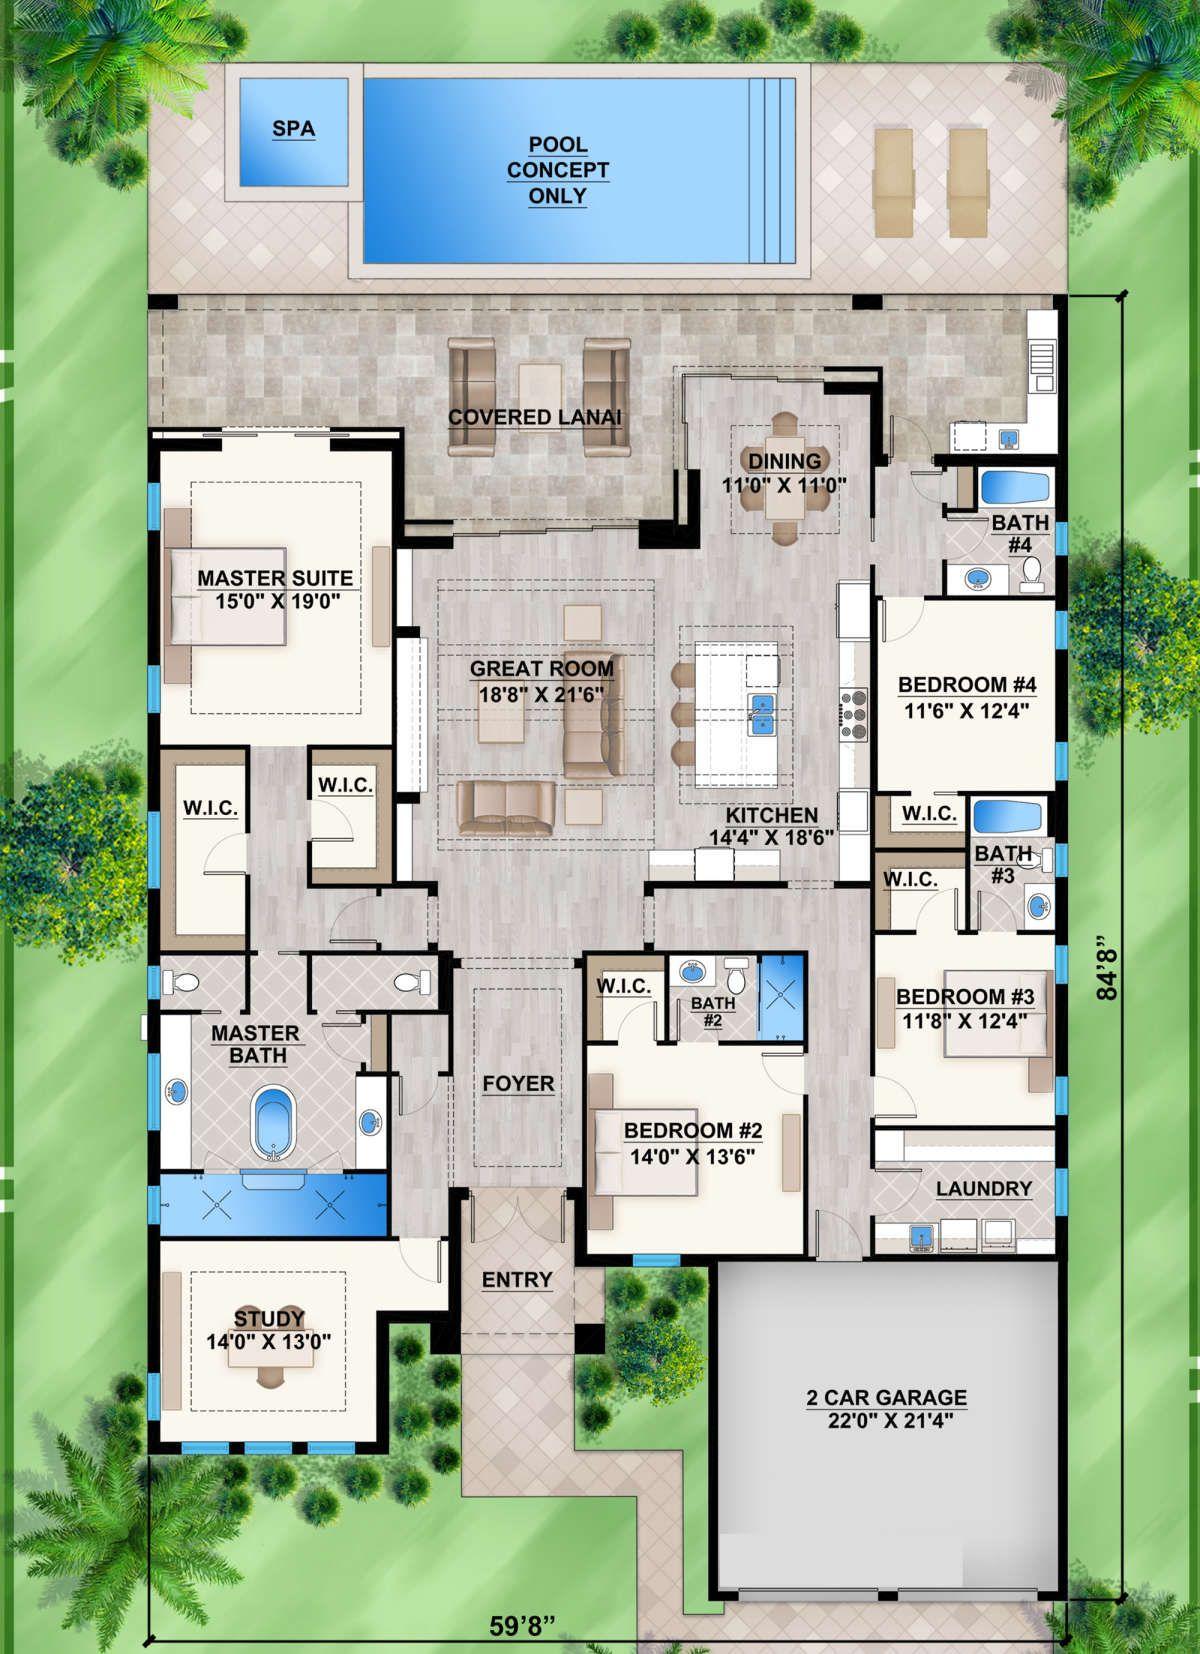 House Plan 207 00073 Coastal Plan 3 289 Square Feet 4 Bedrooms 4 Bathrooms In 2021 Coastal House Plans Pool House Plans 4 Bedroom House Designs